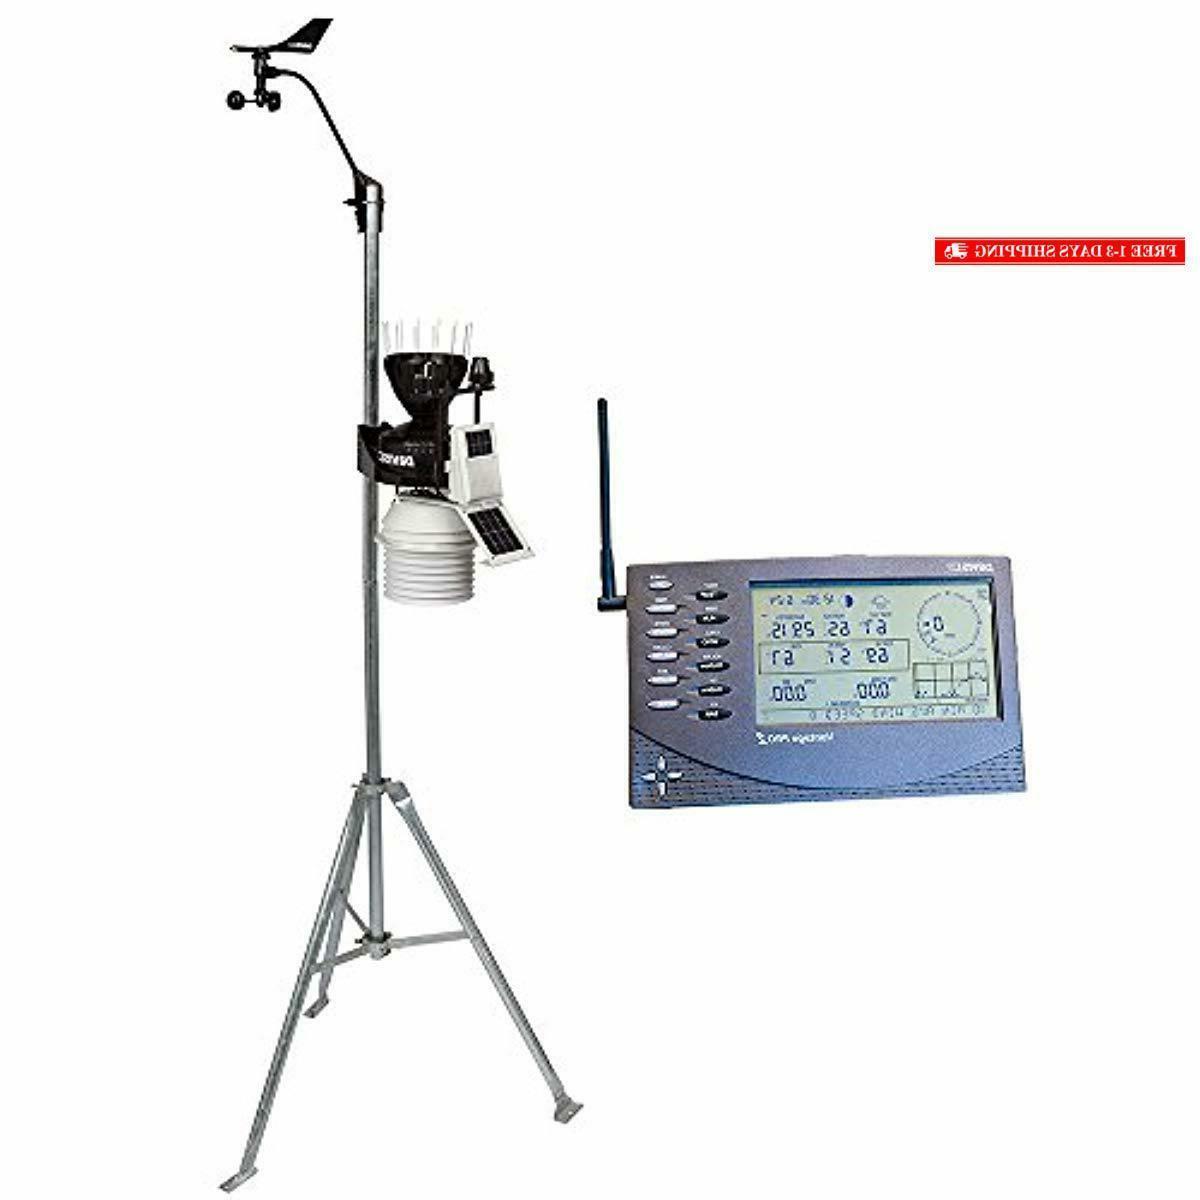 instruments 6163 vantage pro2 plus wireless weather